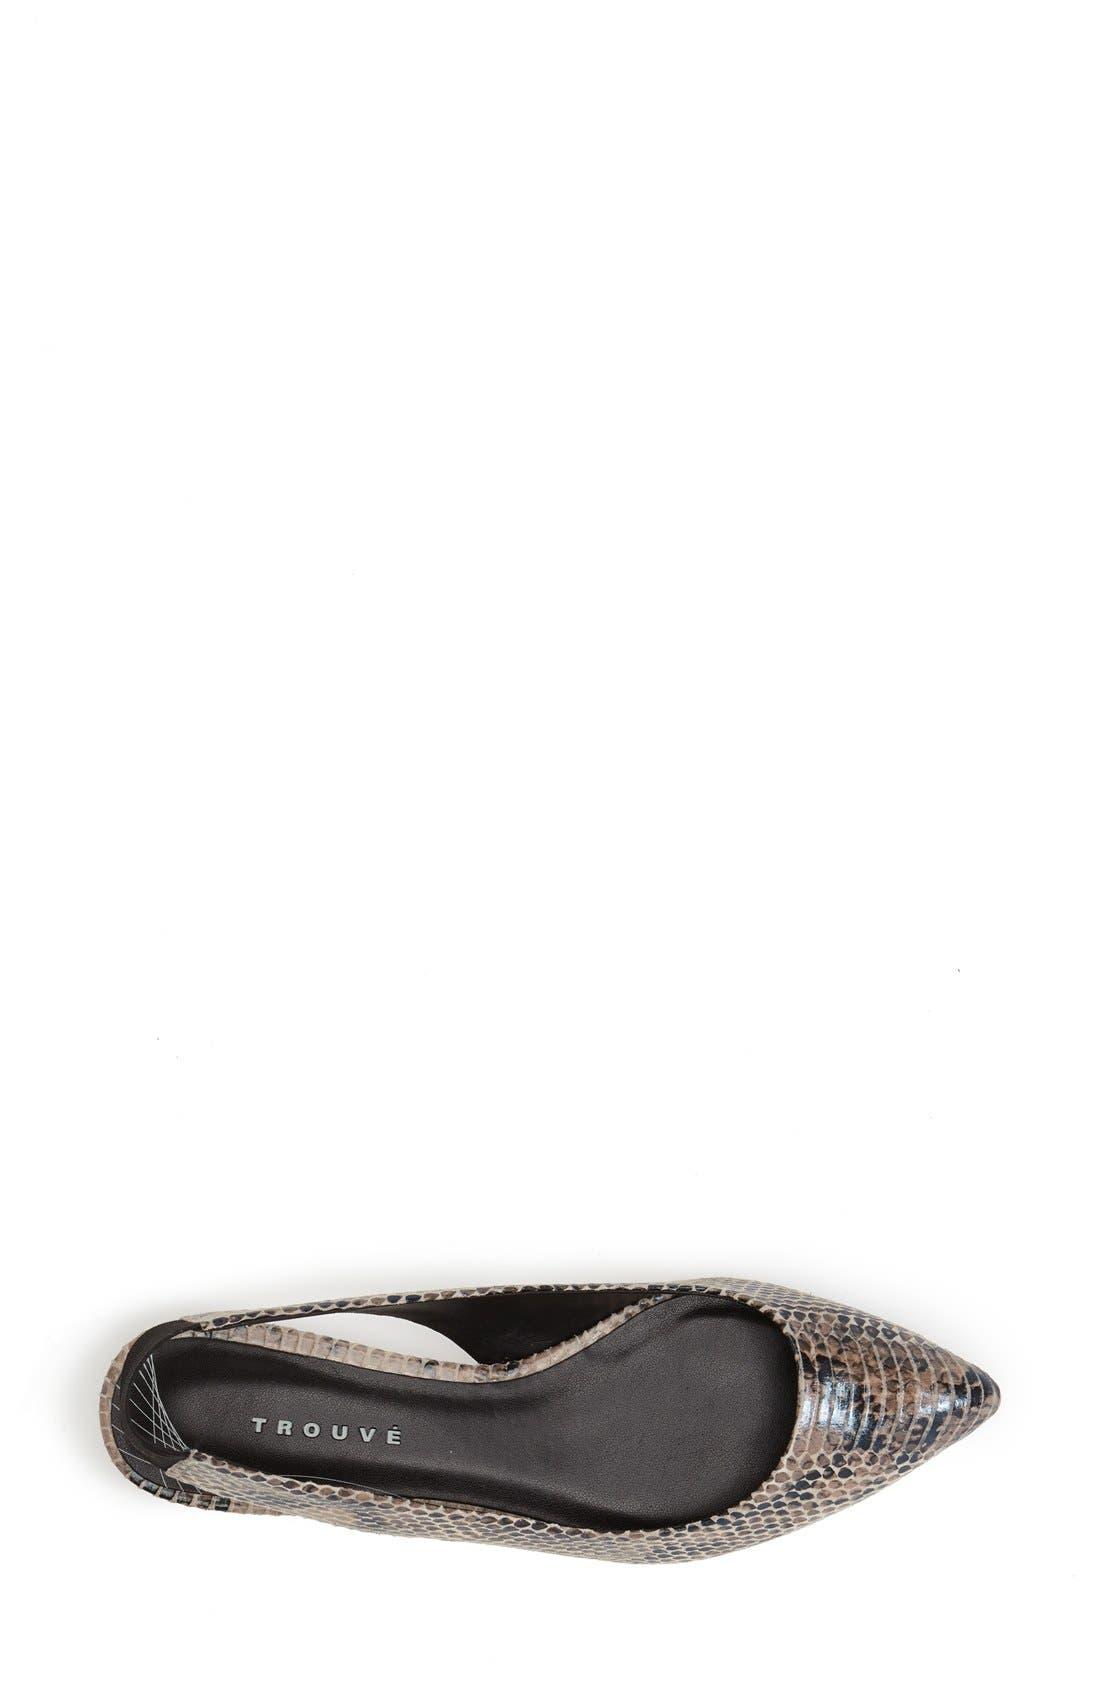 Alternate Image 3  - Trouvé 'Mona' Pointy Toe Leather Flat (Women)